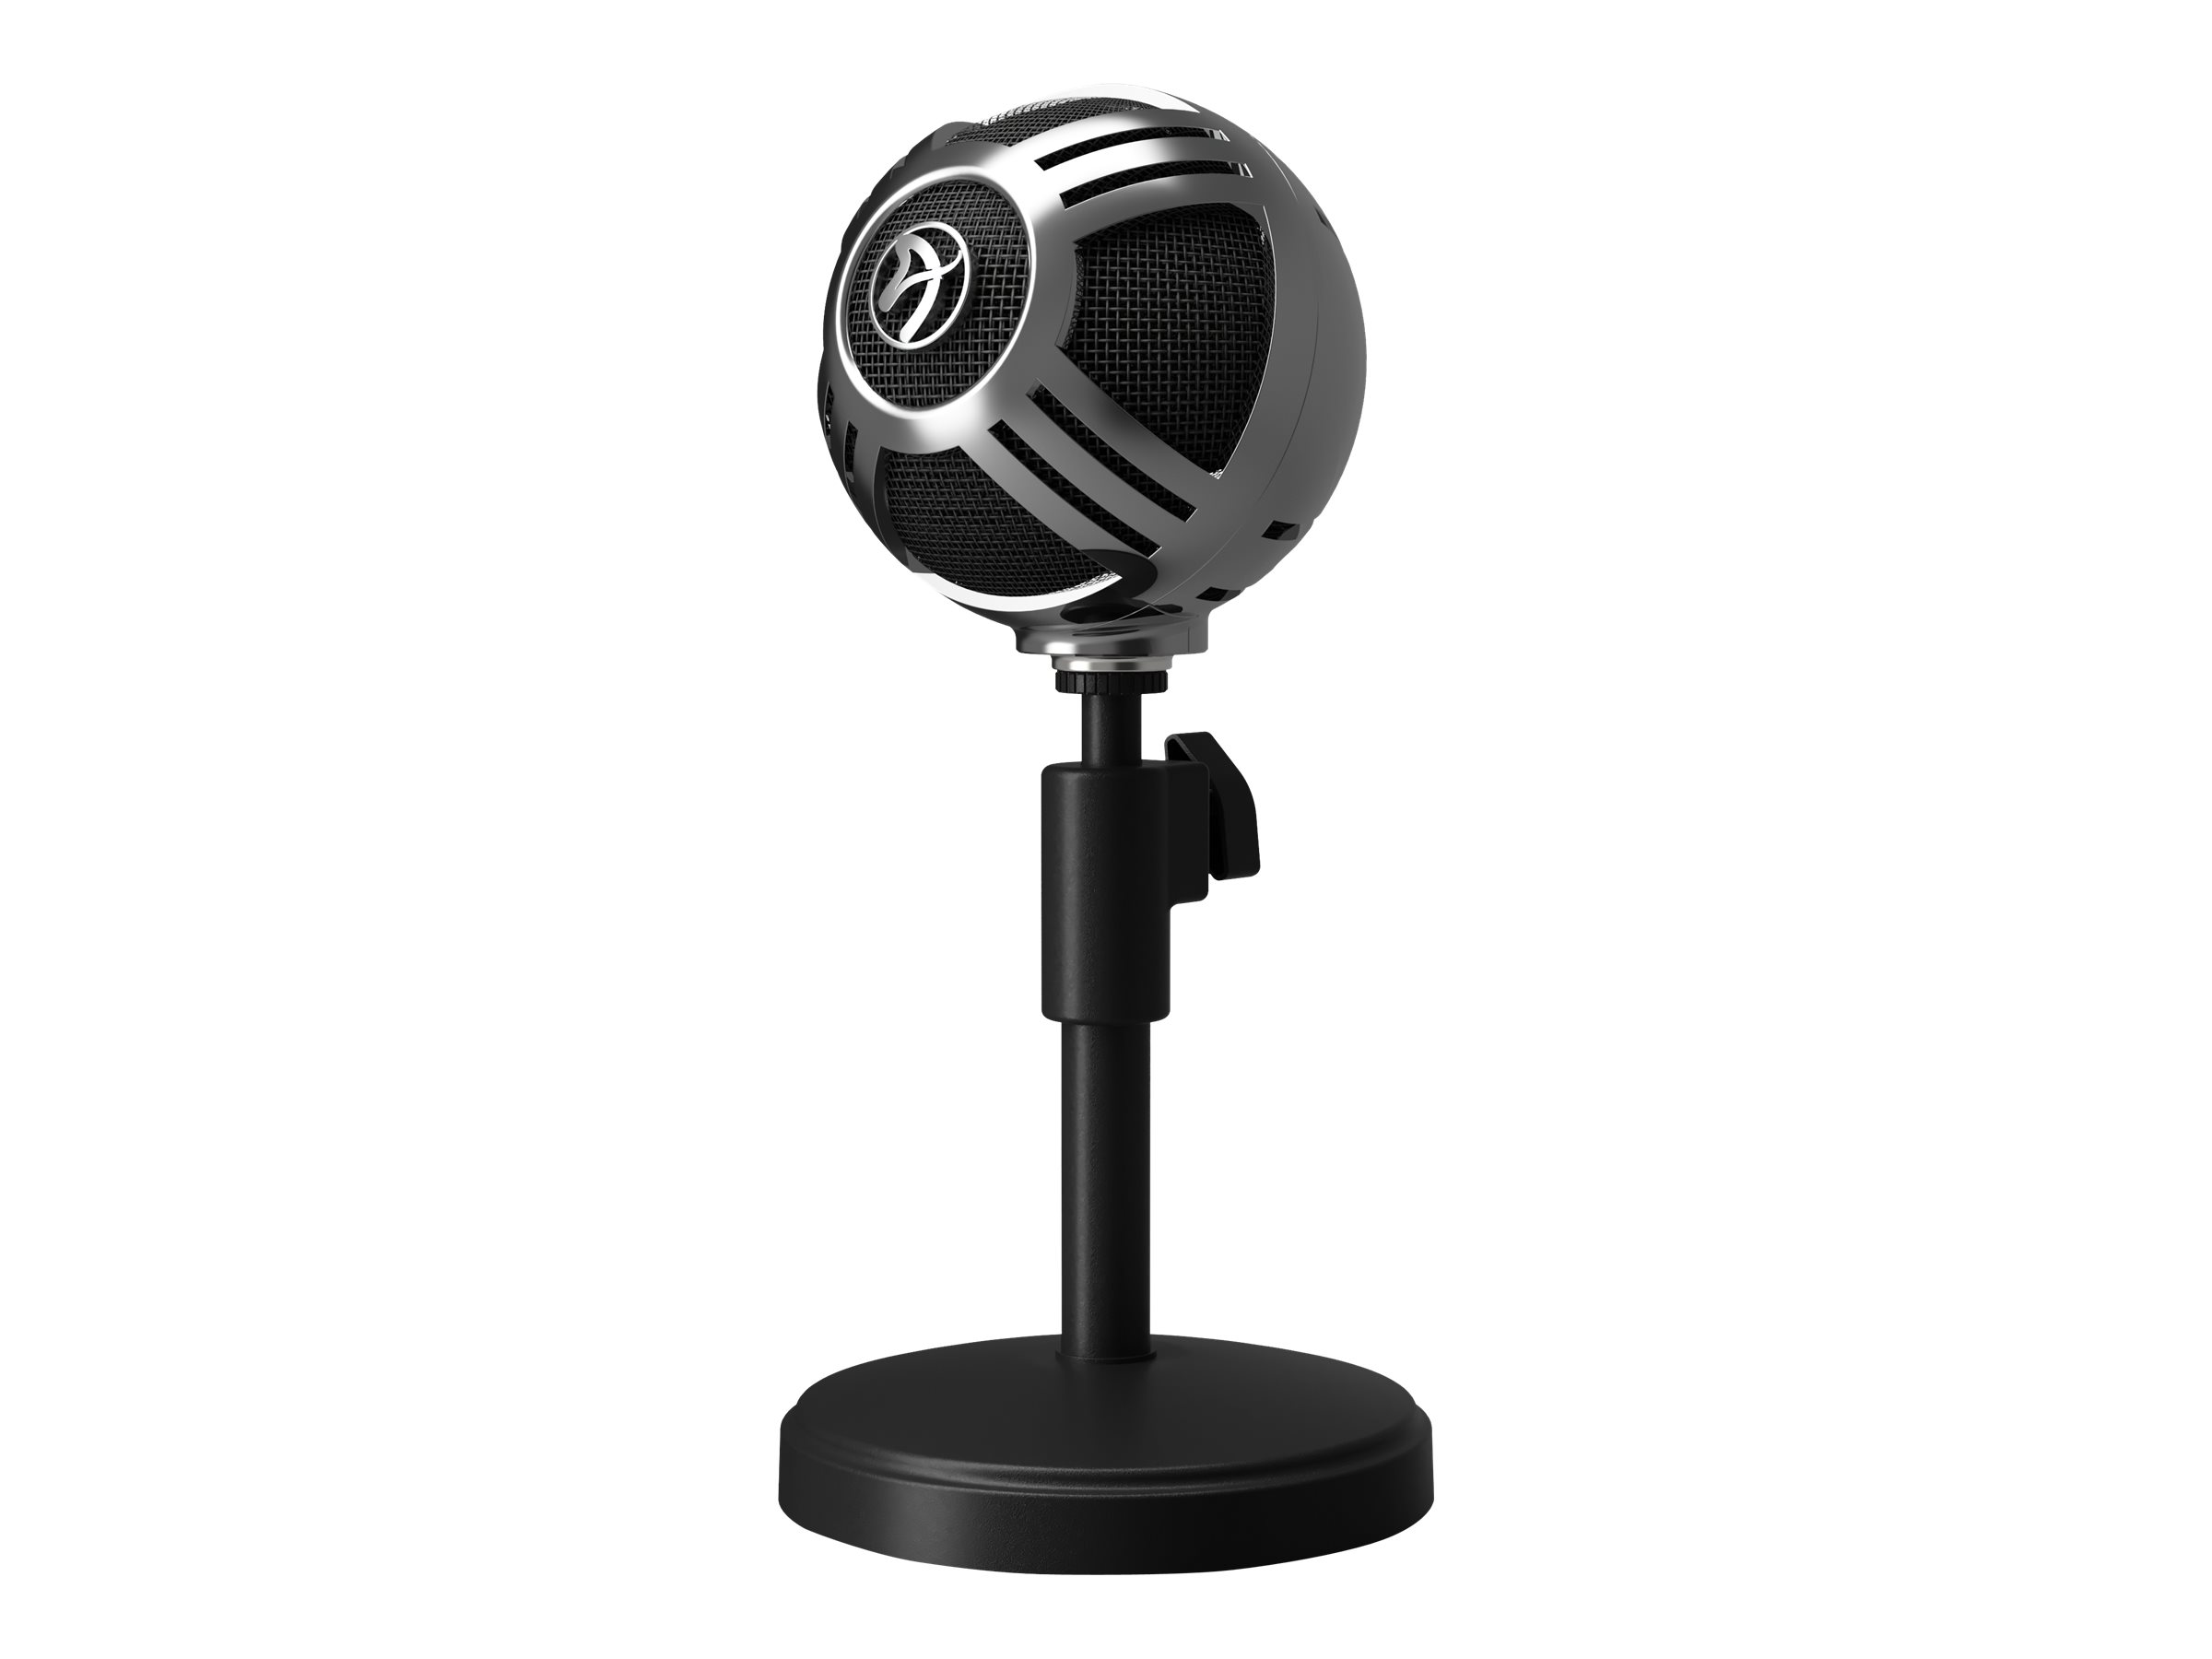 Arozzi Sfera - Mikrofon - kabelgebunden - USB - chrom